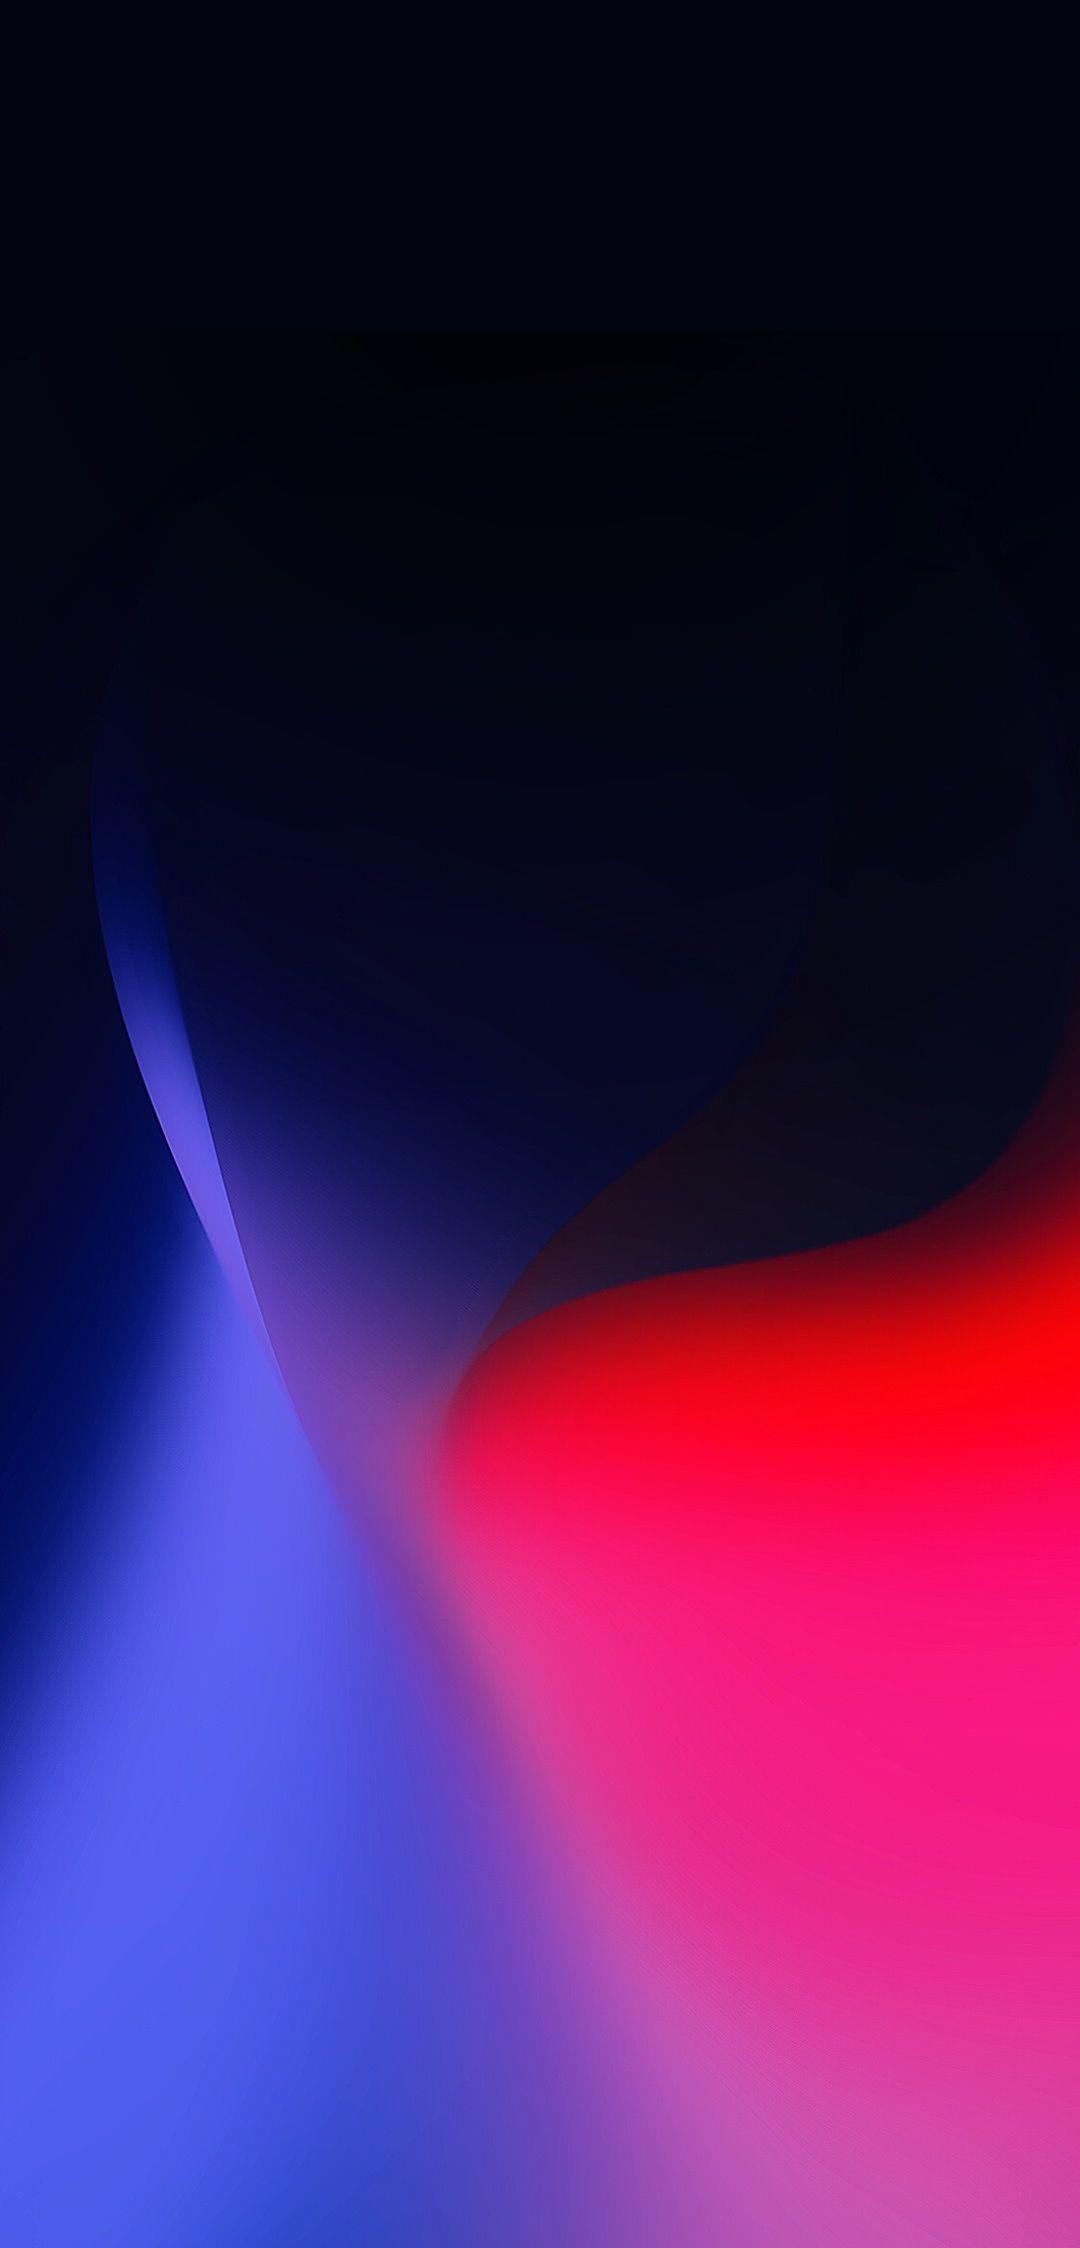 Xiaomi Mi 8 Wallpapers Top Free Xiaomi Mi 8 Backgrounds Wallpaperaccess